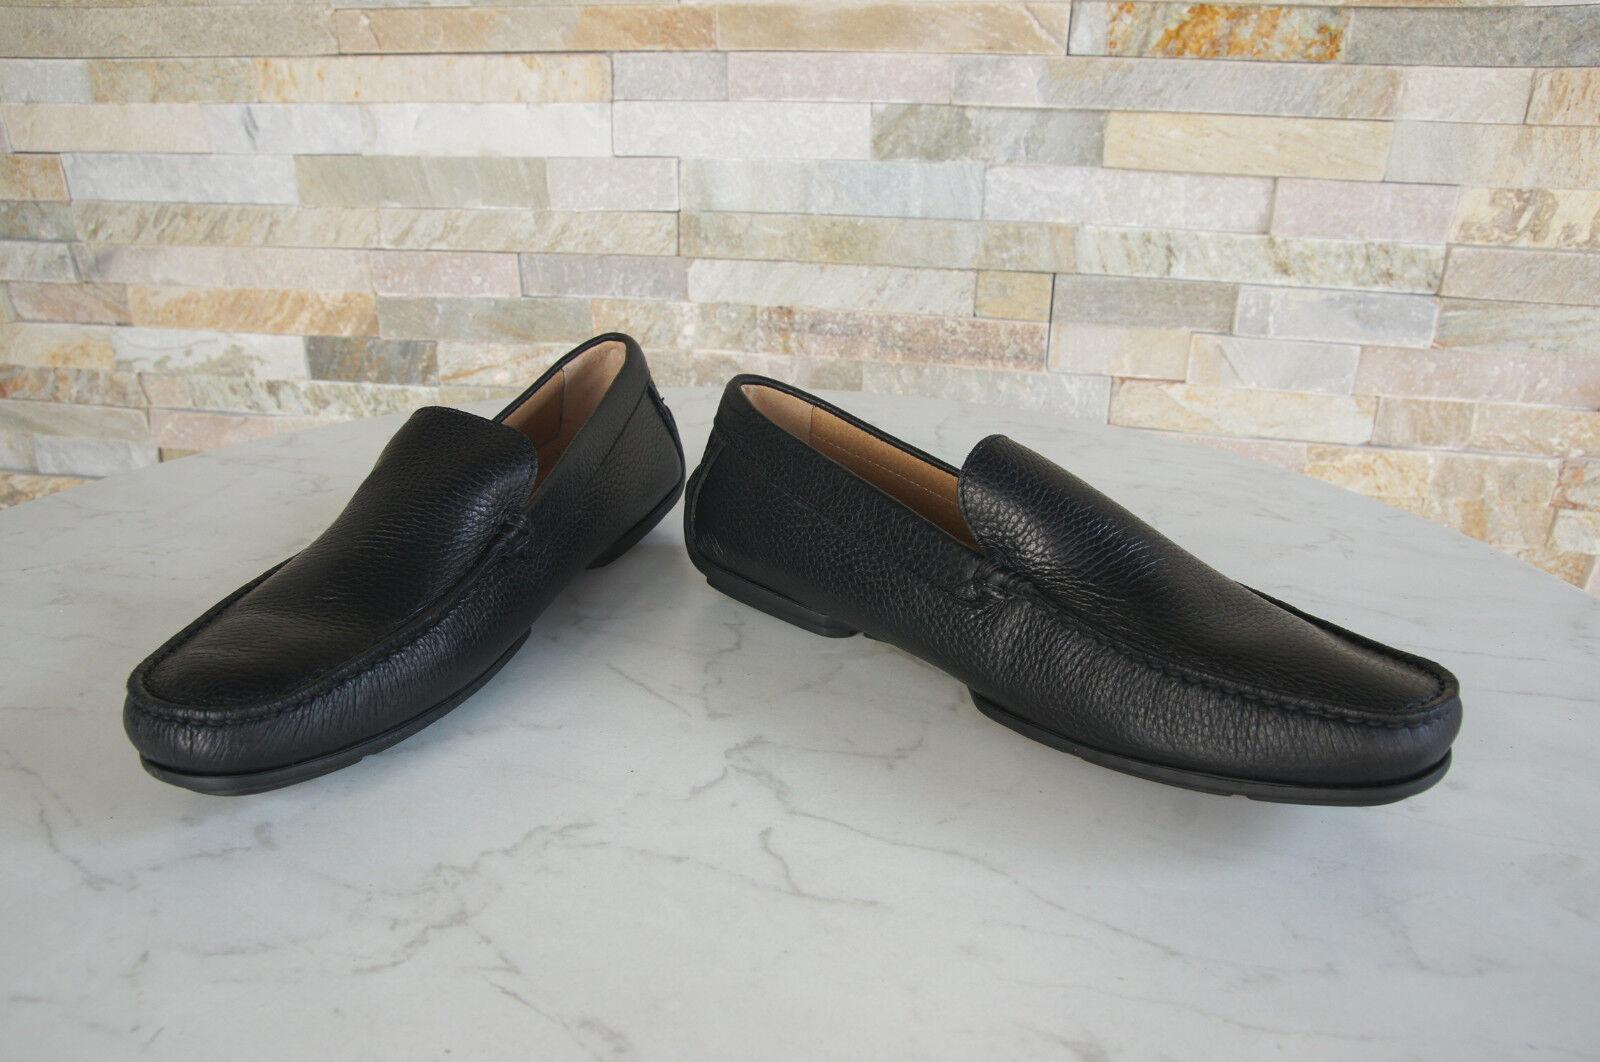 Harmont & Blaine Shoes Size 41,5 Slippers Moccasins Low Shoes Blaine Black New 56987b